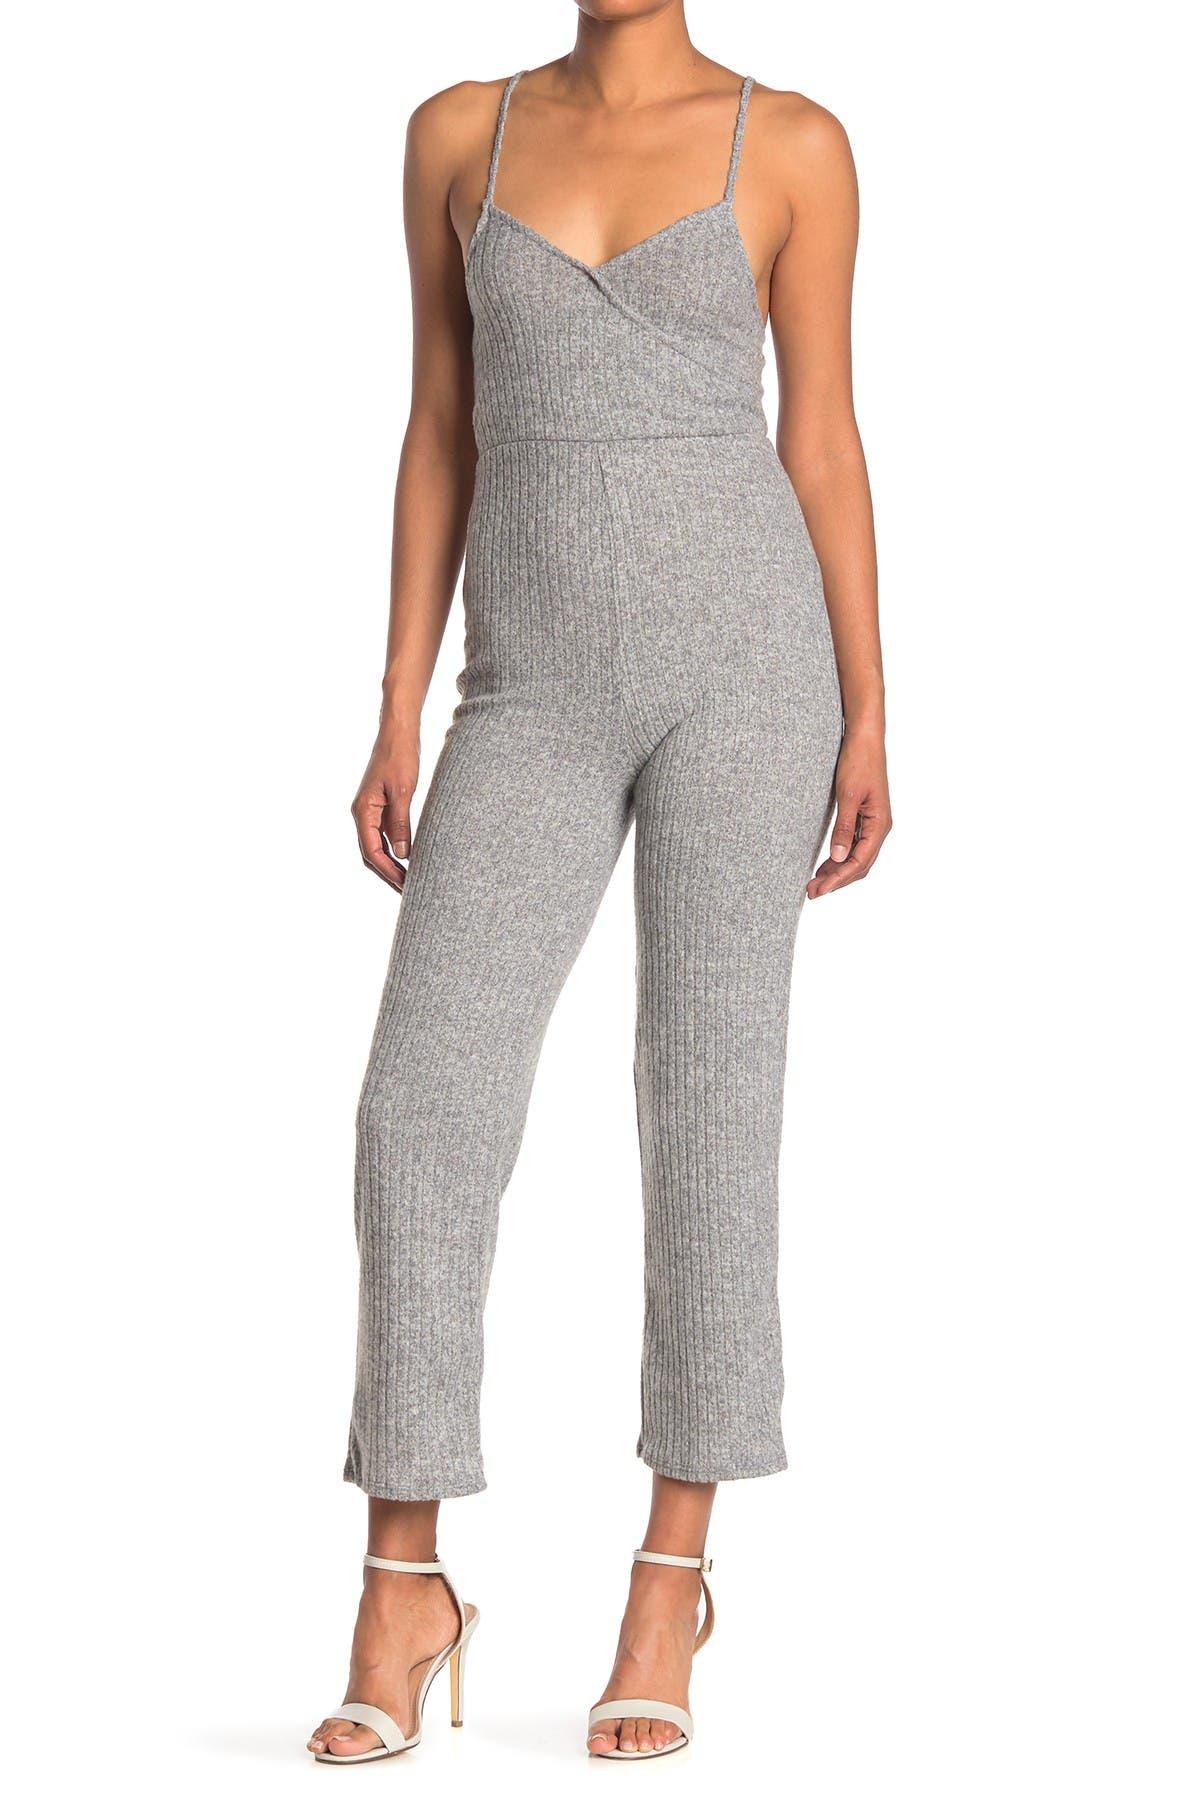 Image of Velvet Torch Heathered Rib Knit Jumpsuit